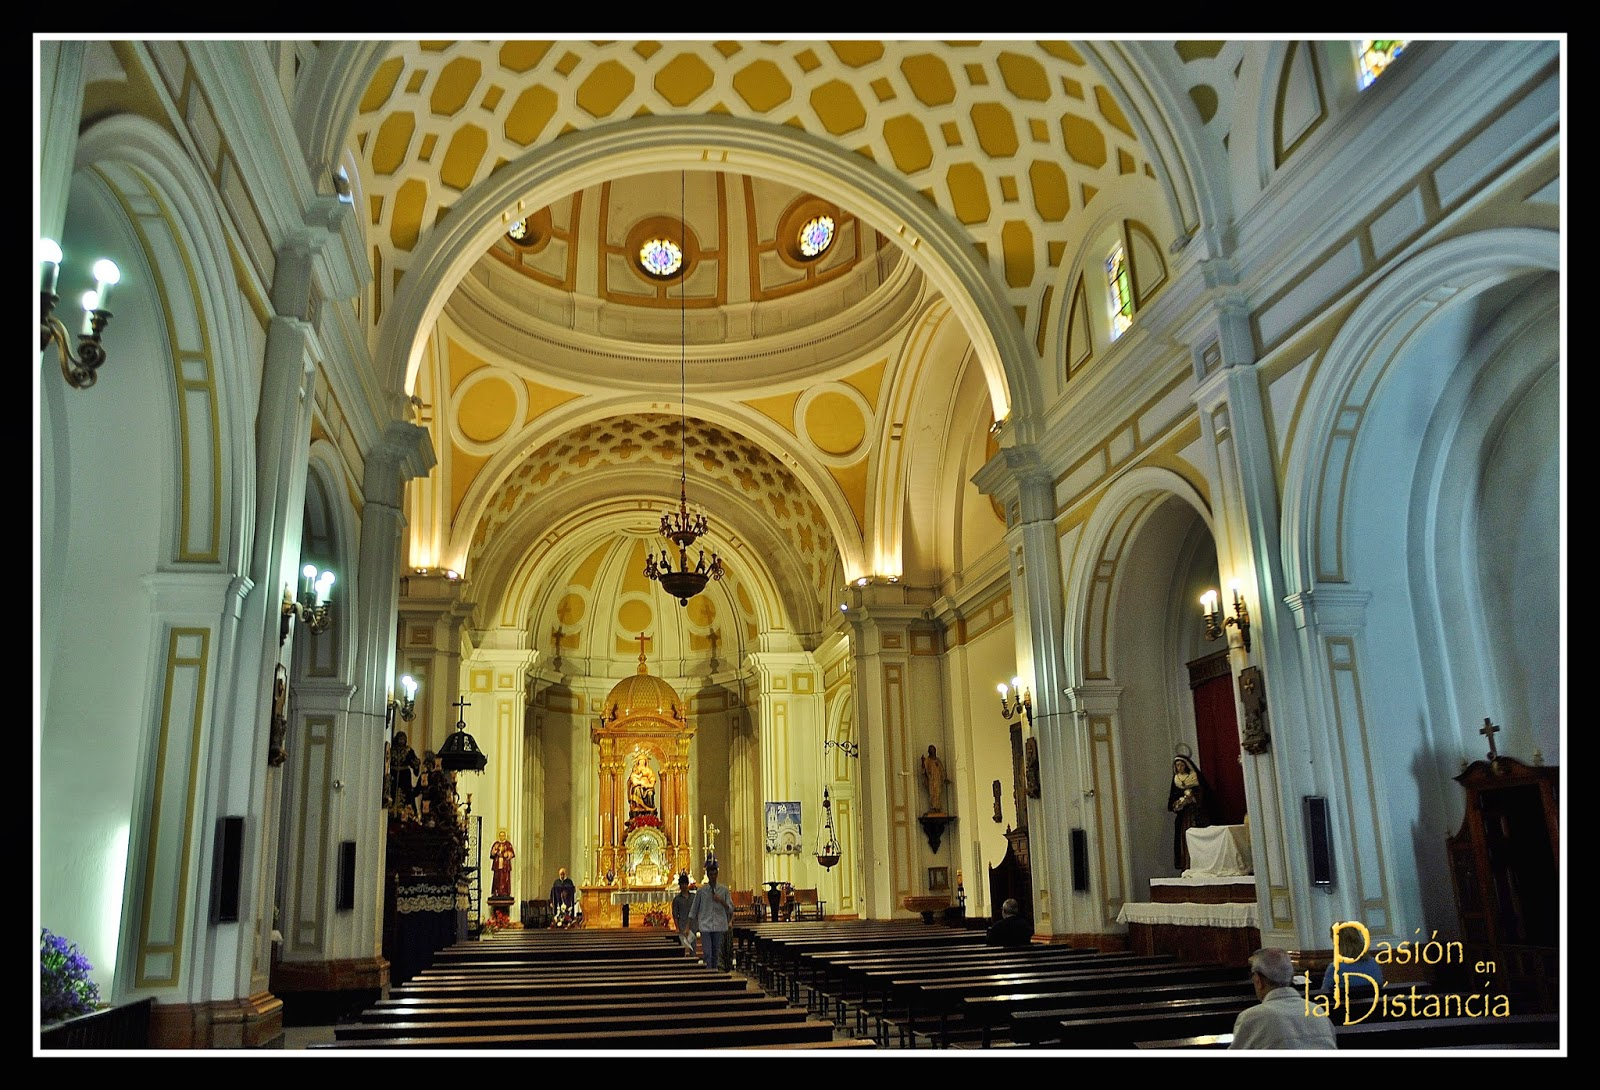 La-Misión-Semana-Santa-2015-Sevilla